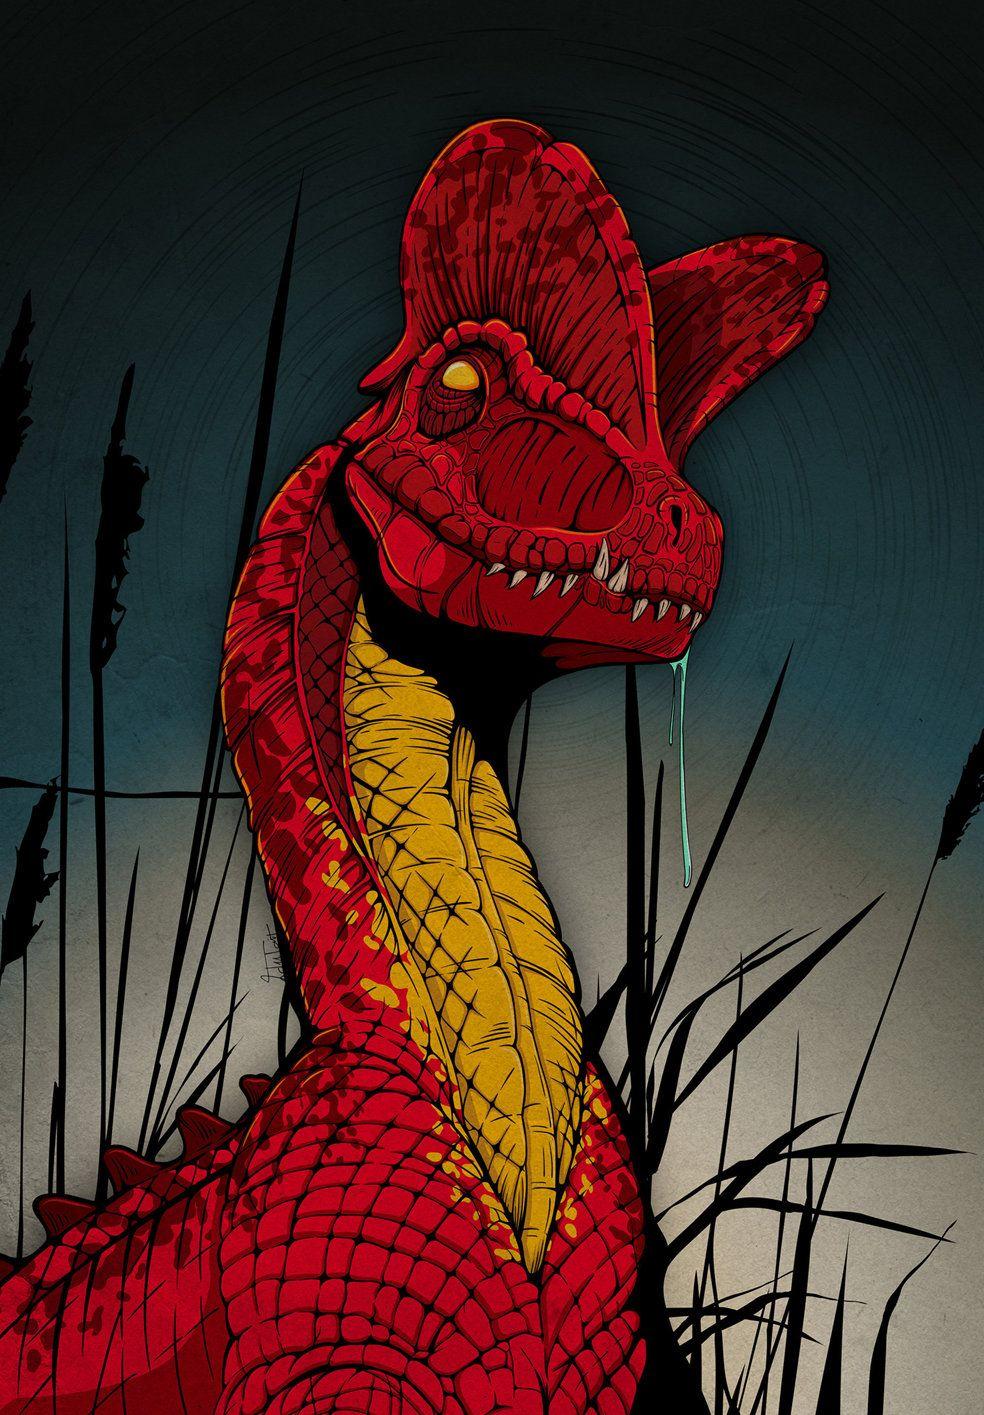 Dilophosaurus Dinosaur Print - Jurassic World